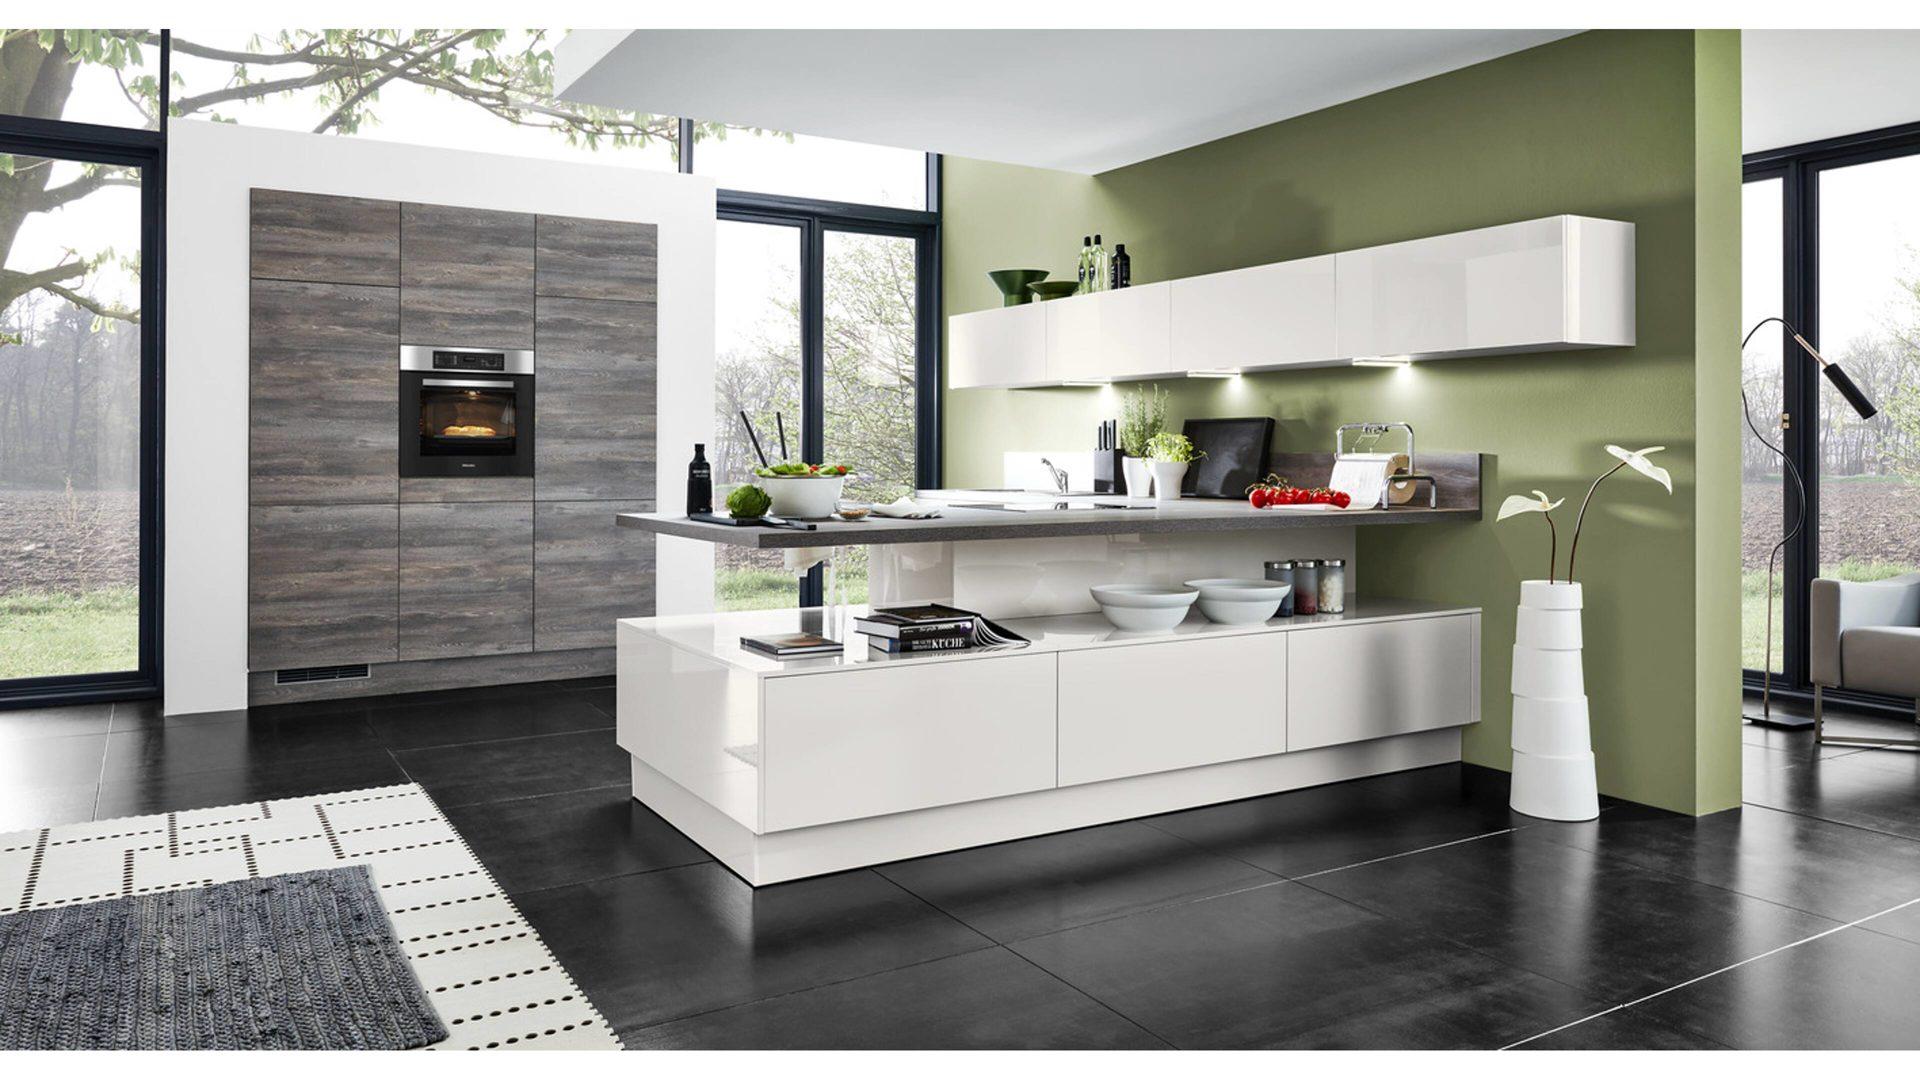 Möbel Boer Coesfeld, Markenshops, Einbauküchen, Culineo, Culineo ...